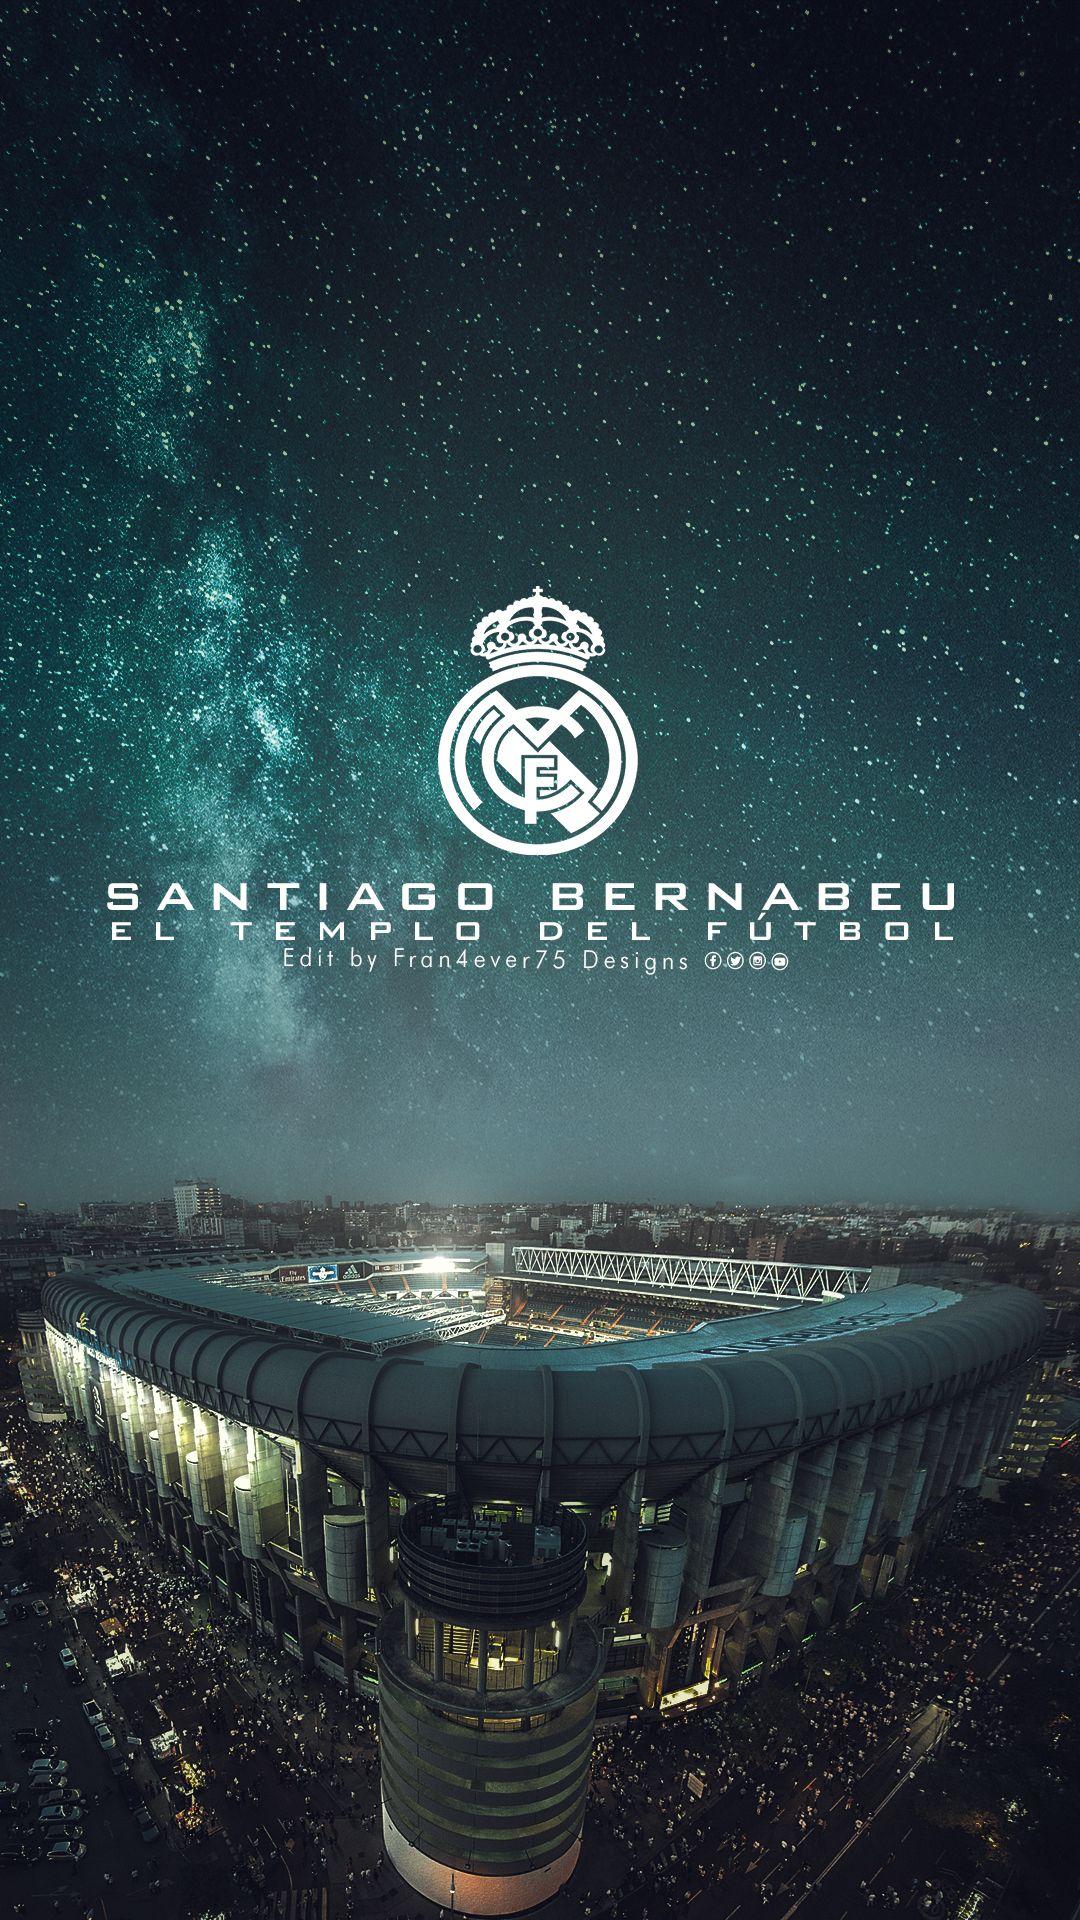 Estadio Santiago Bernabeu El Templo Del Madridismo Bambang Pamungkas Gambar Sepak Bola Gambar